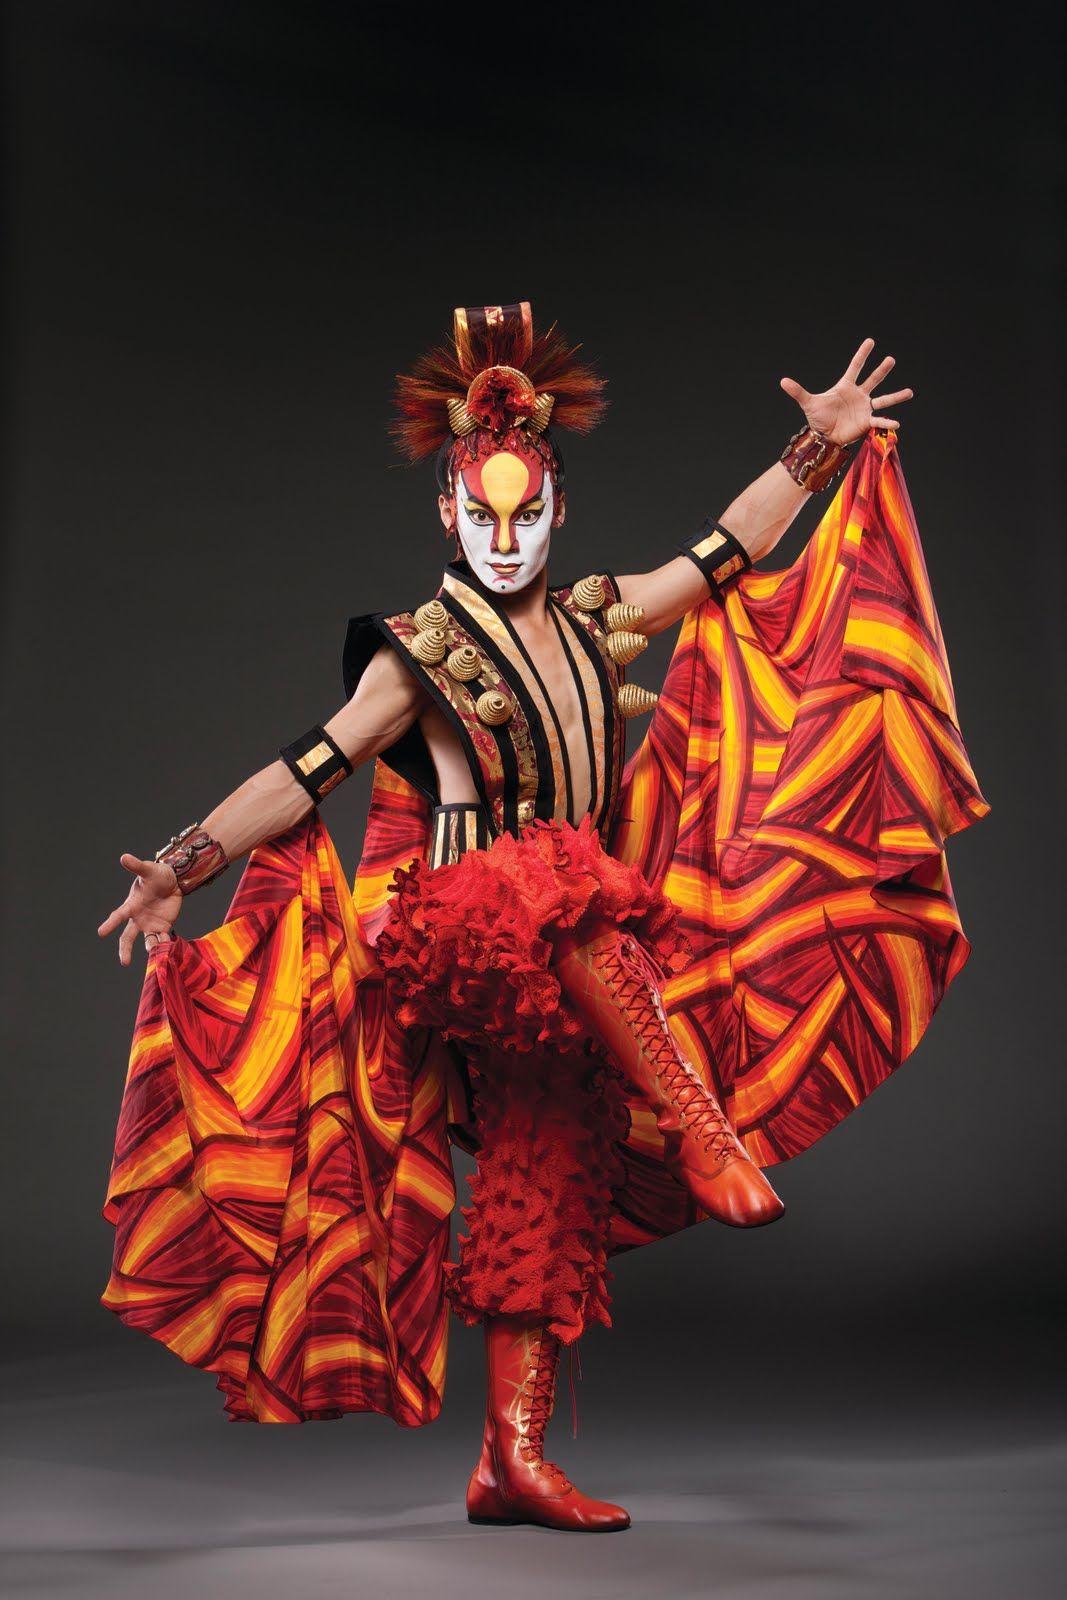 Circo soleil espect culo que el cirque du soleil for Espectaculo circo de soleil